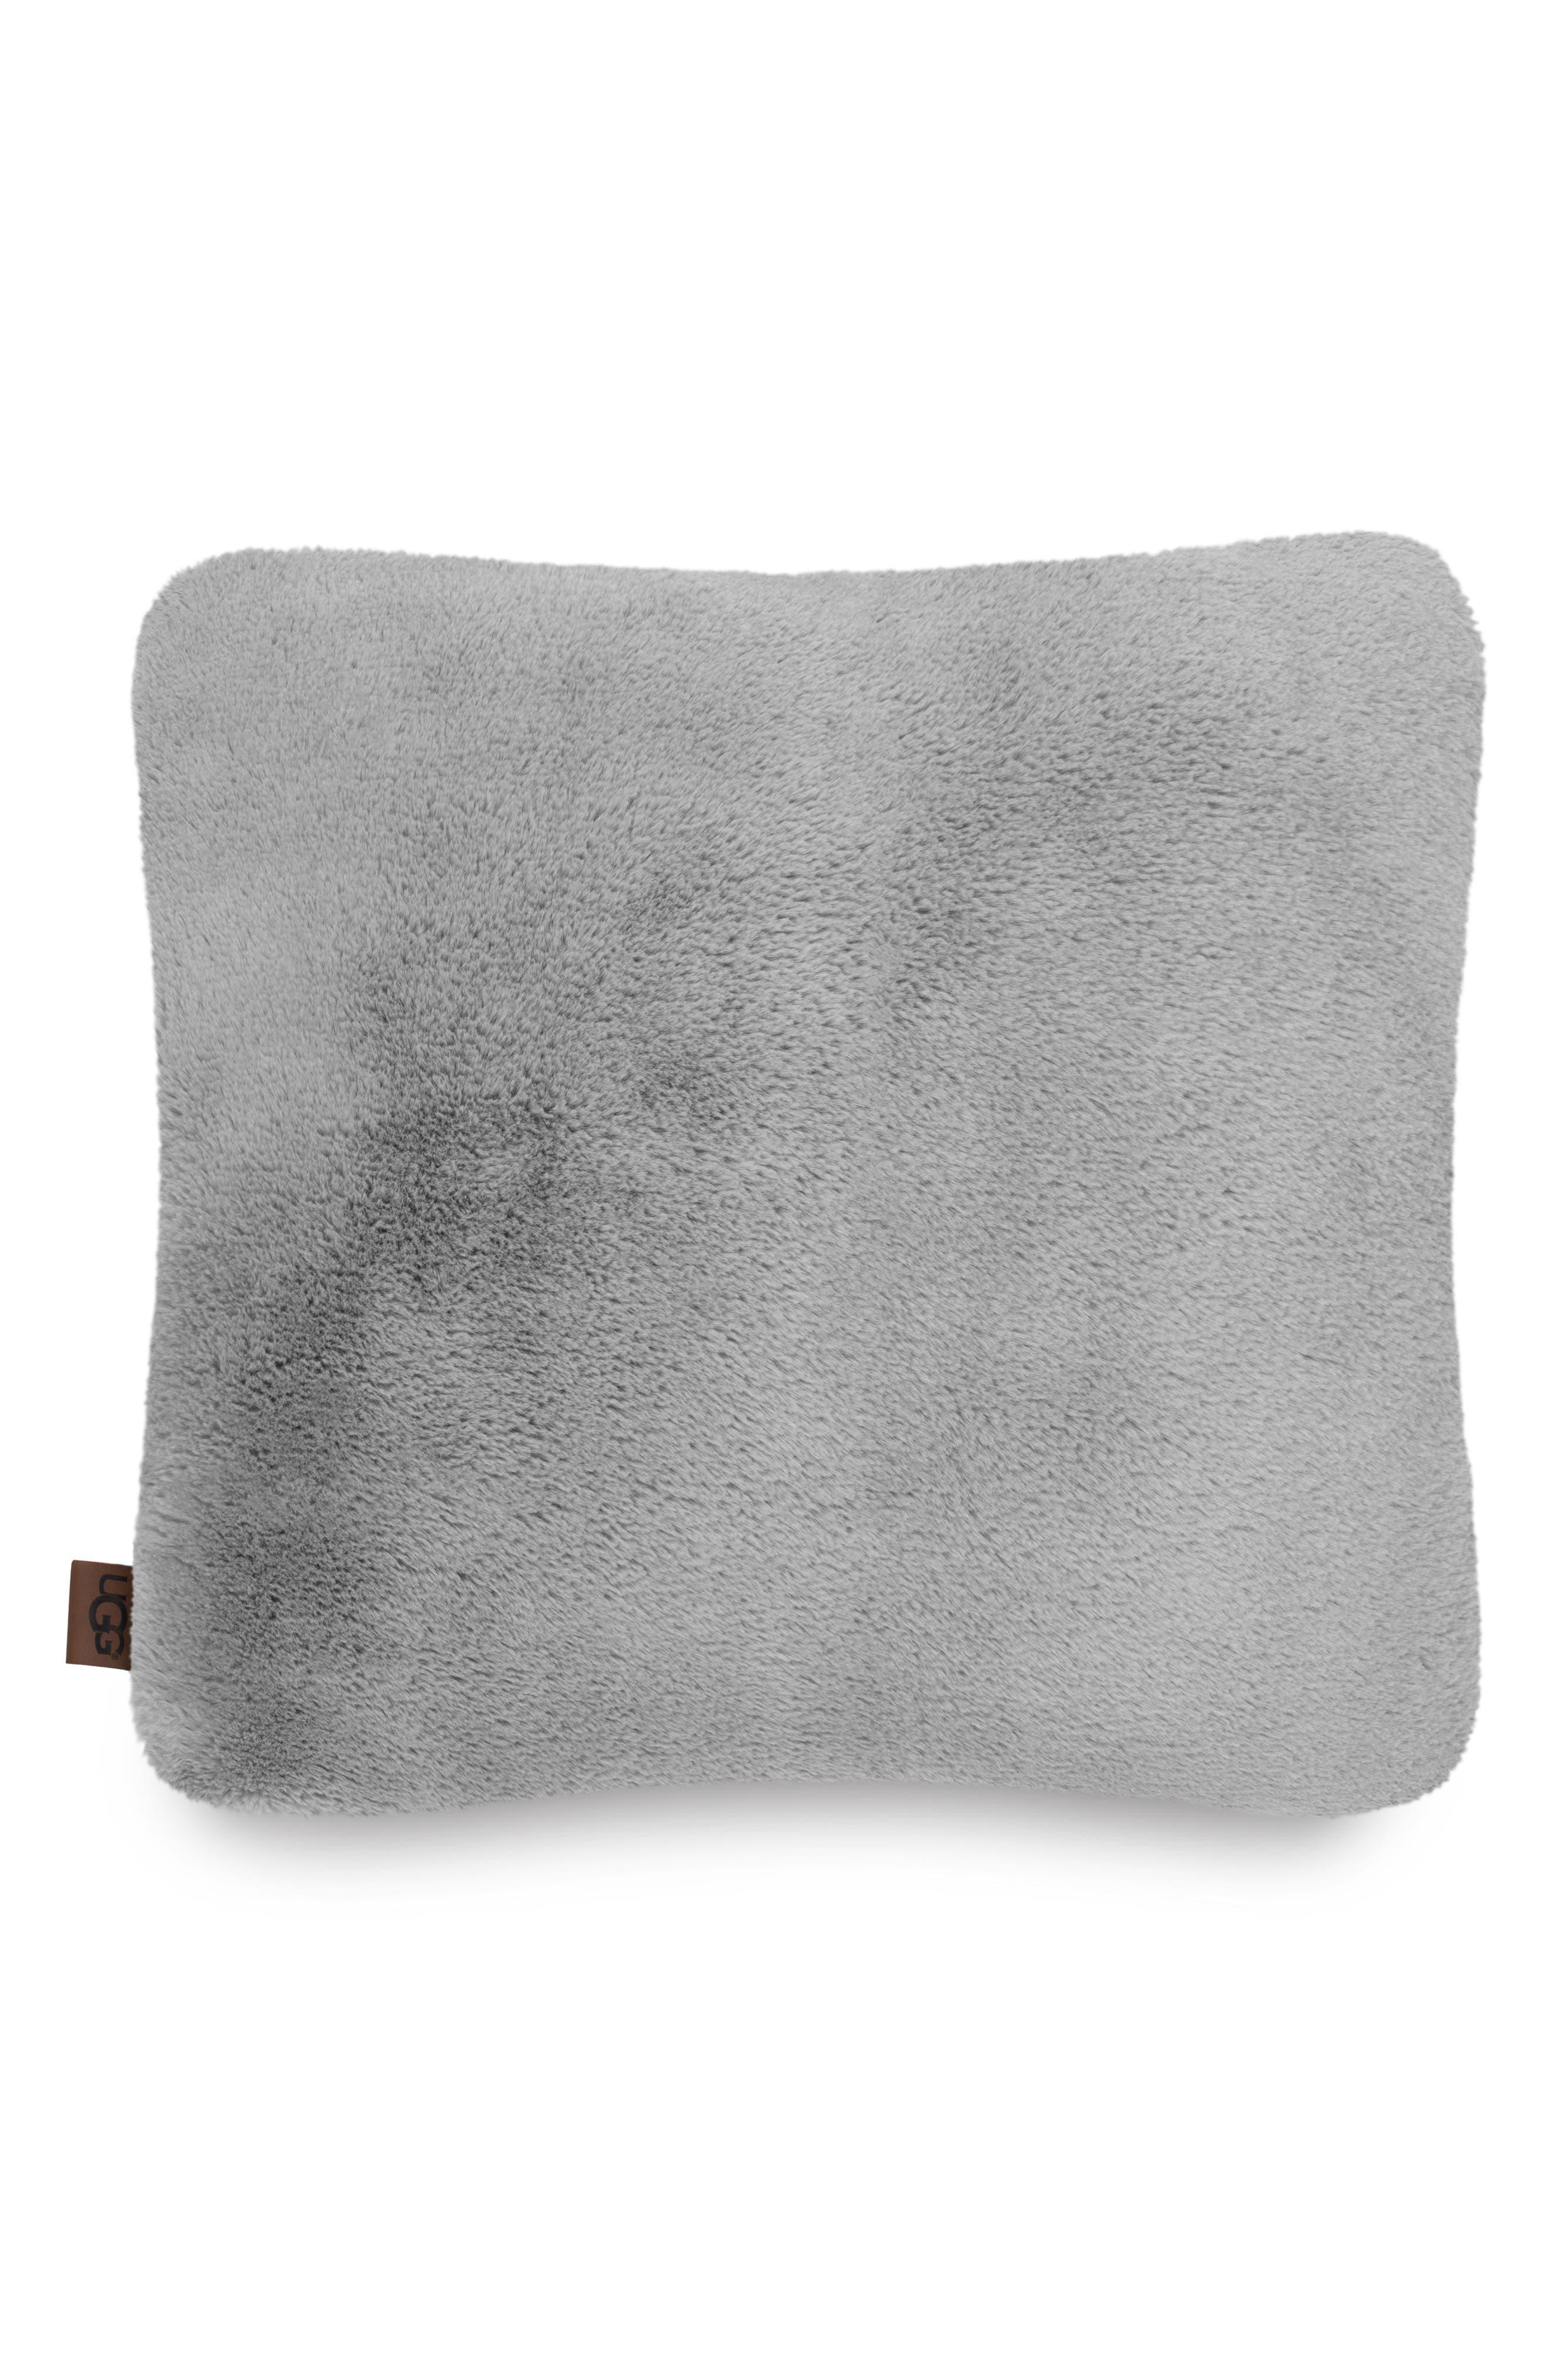 UGG<SUP>®</SUP> Coastline Faux Fur Pillow, Main, color, SEAL